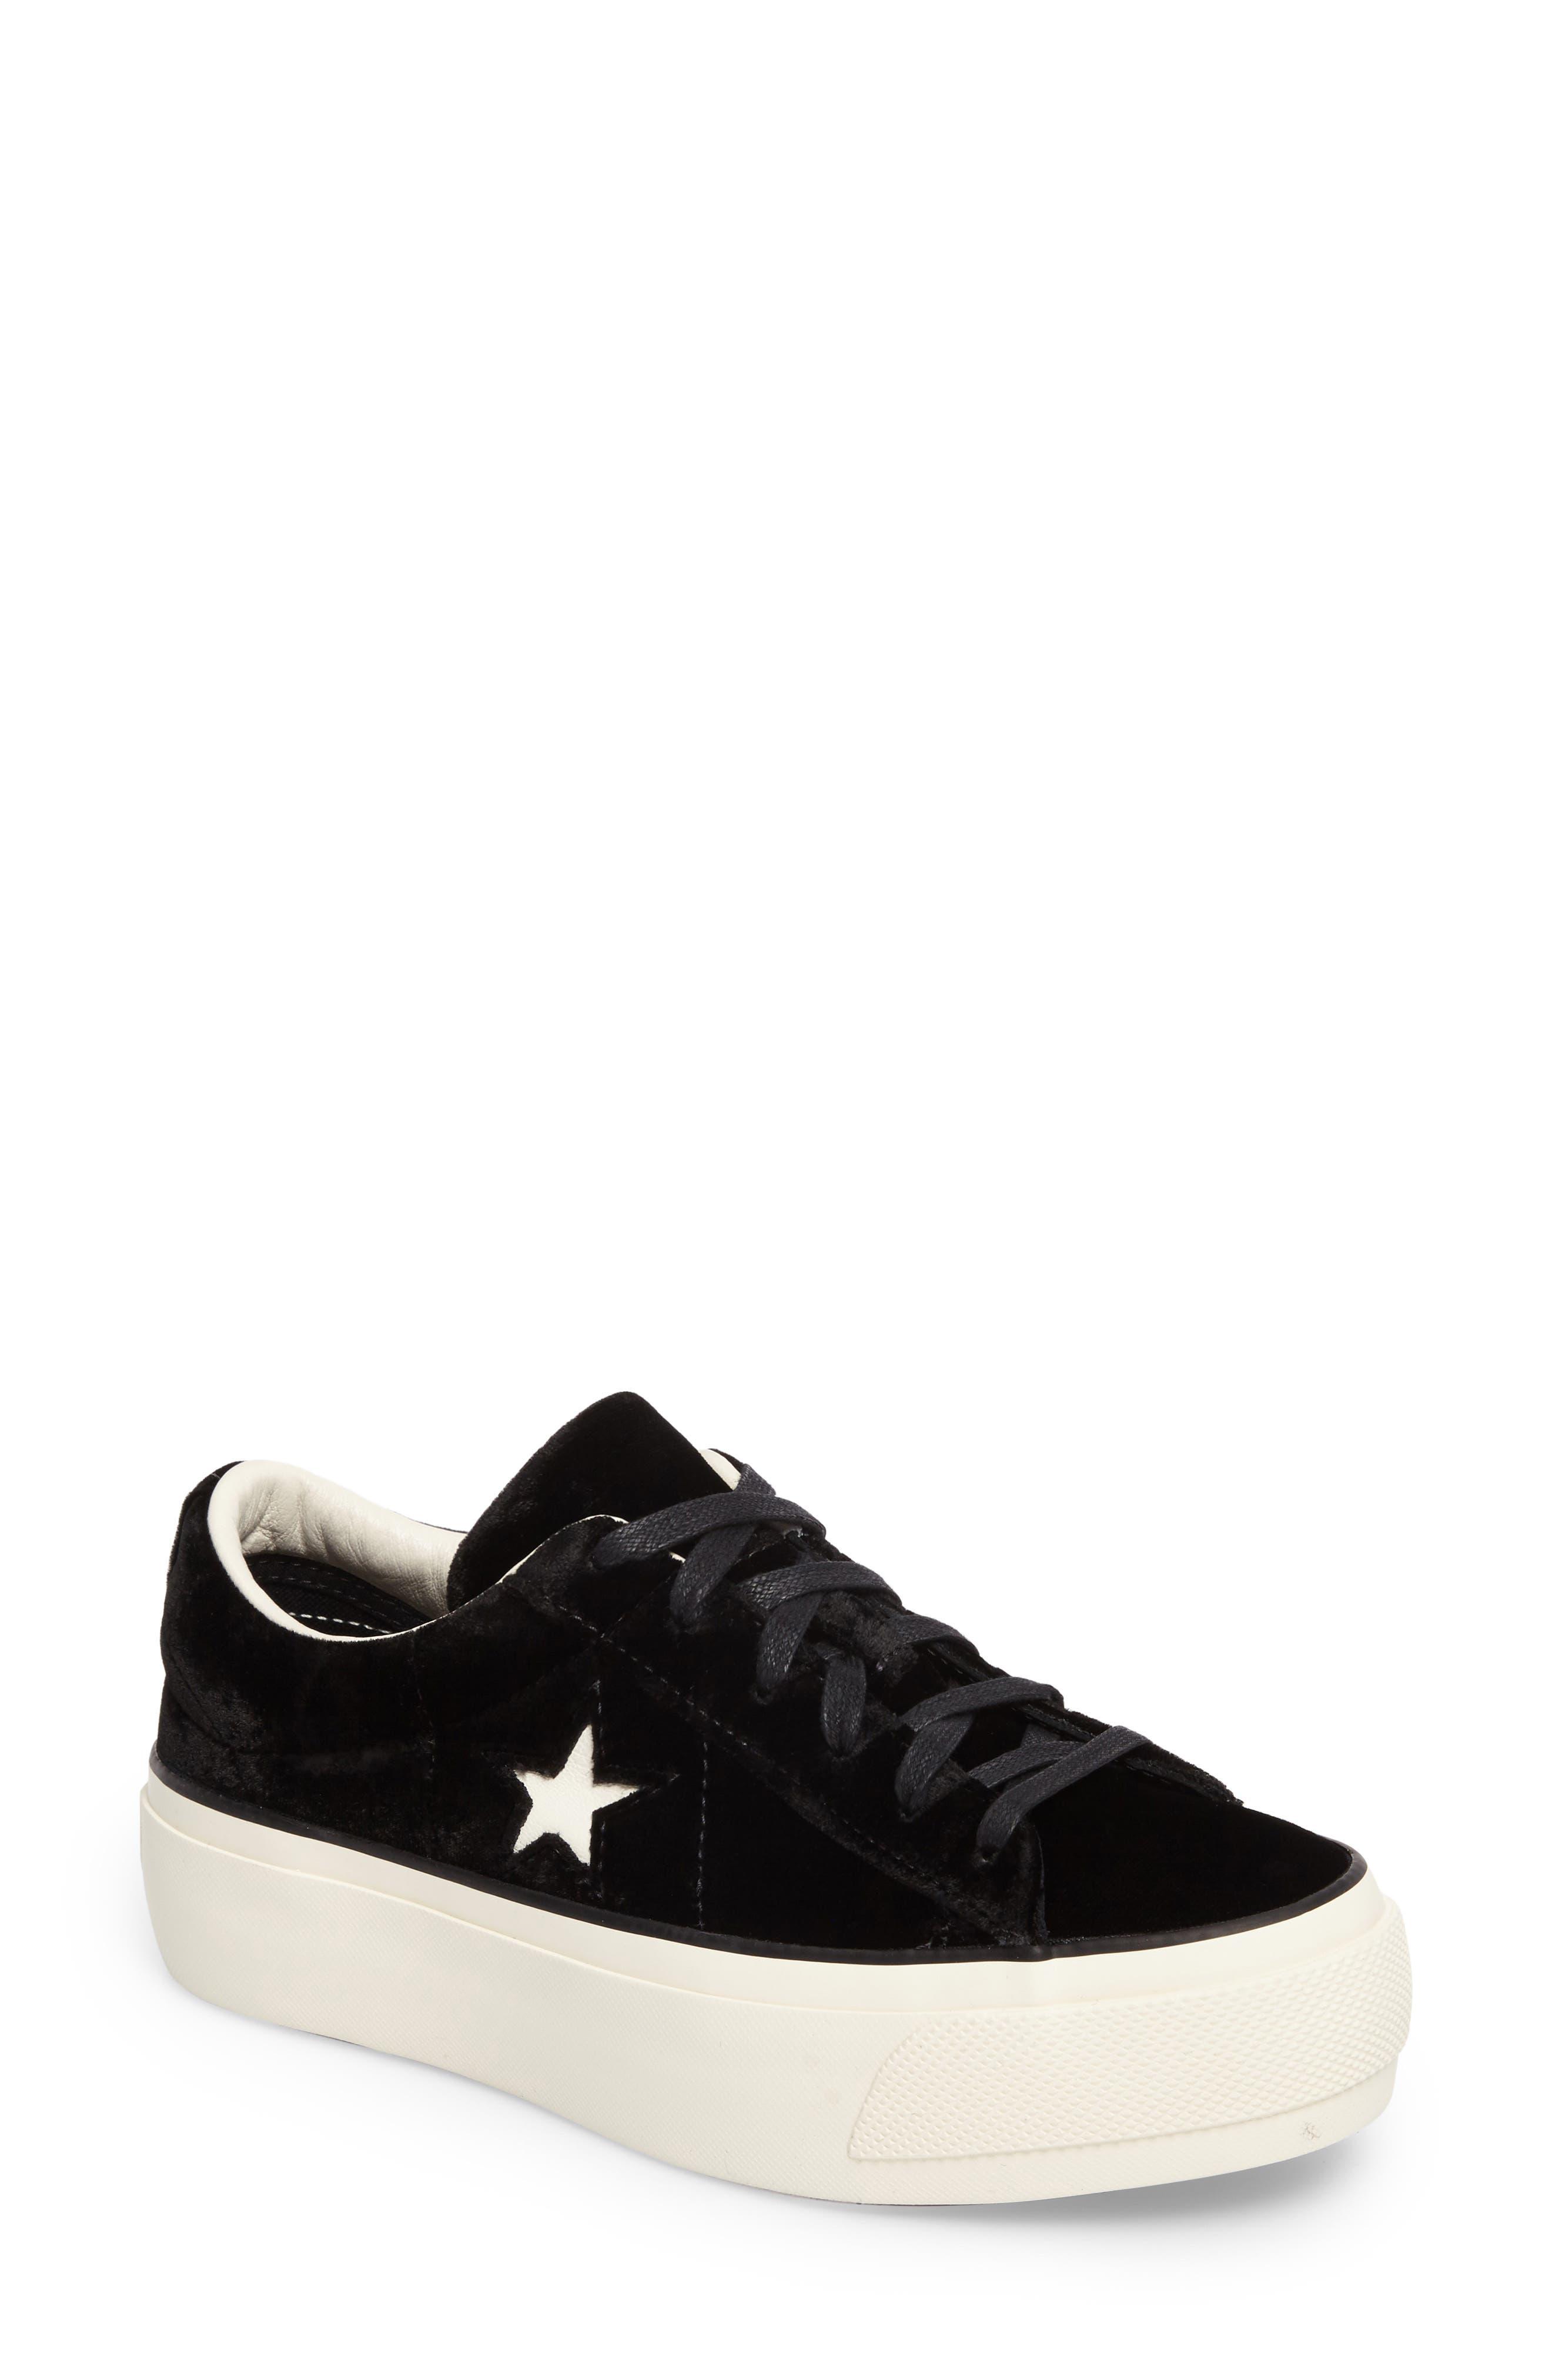 Chuck Taylor<sup>®</sup> One Star Platform Sneaker,                             Main thumbnail 1, color,                             001